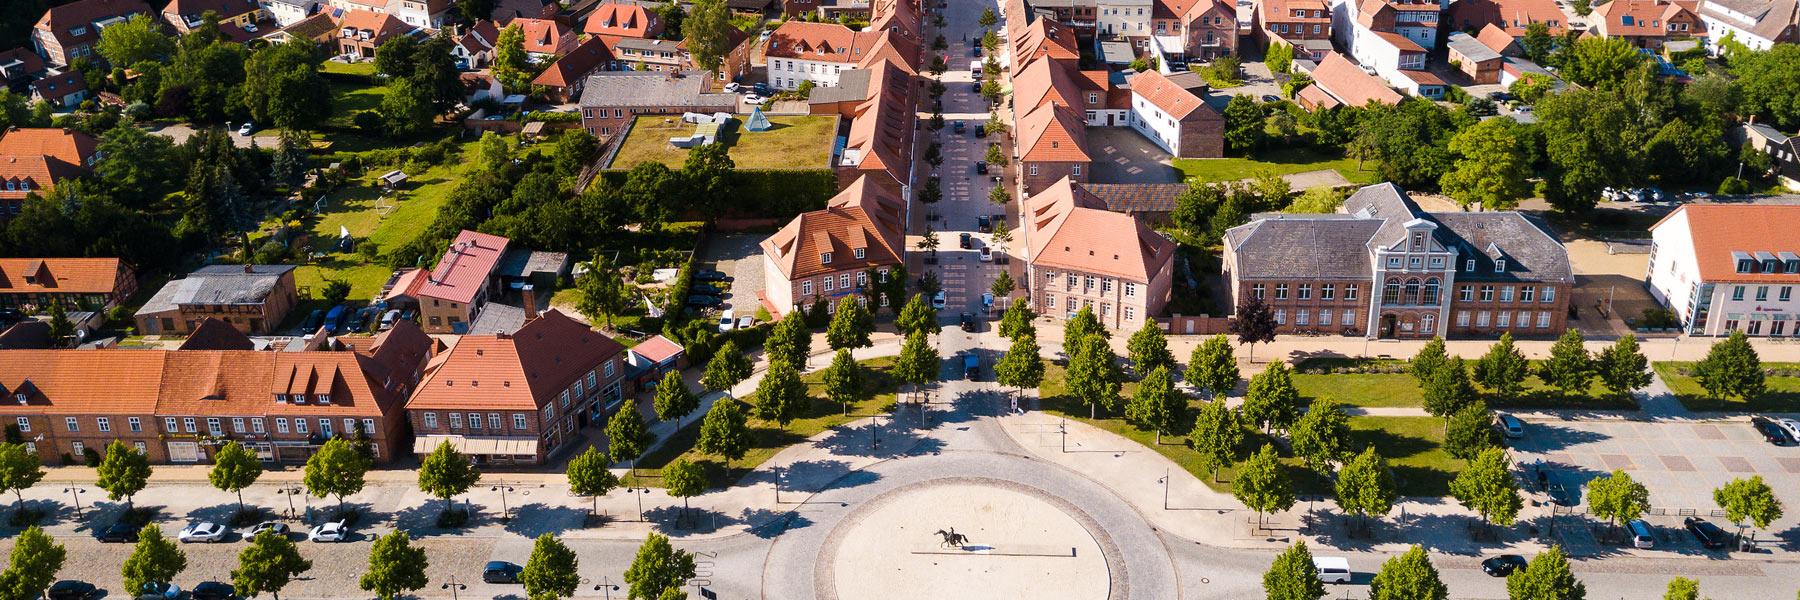 Schlossstrasse - Stadt Ludwigslust